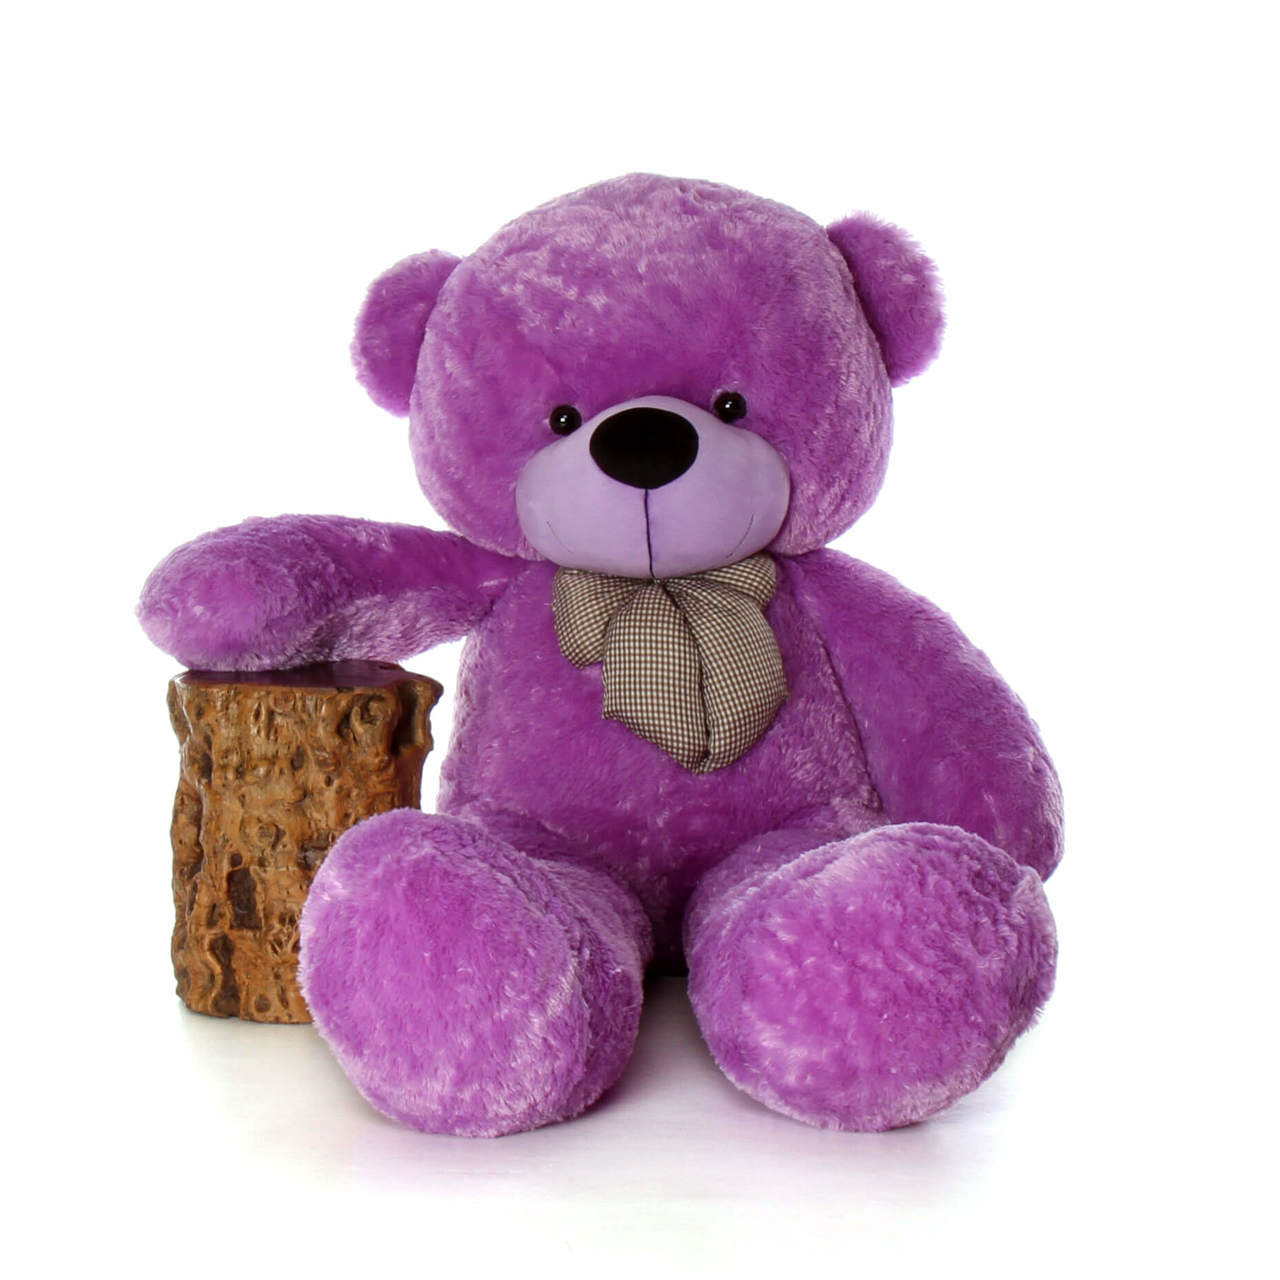 72in Purple Life Size Teddy DeeDee Cuddles Enormously Huge